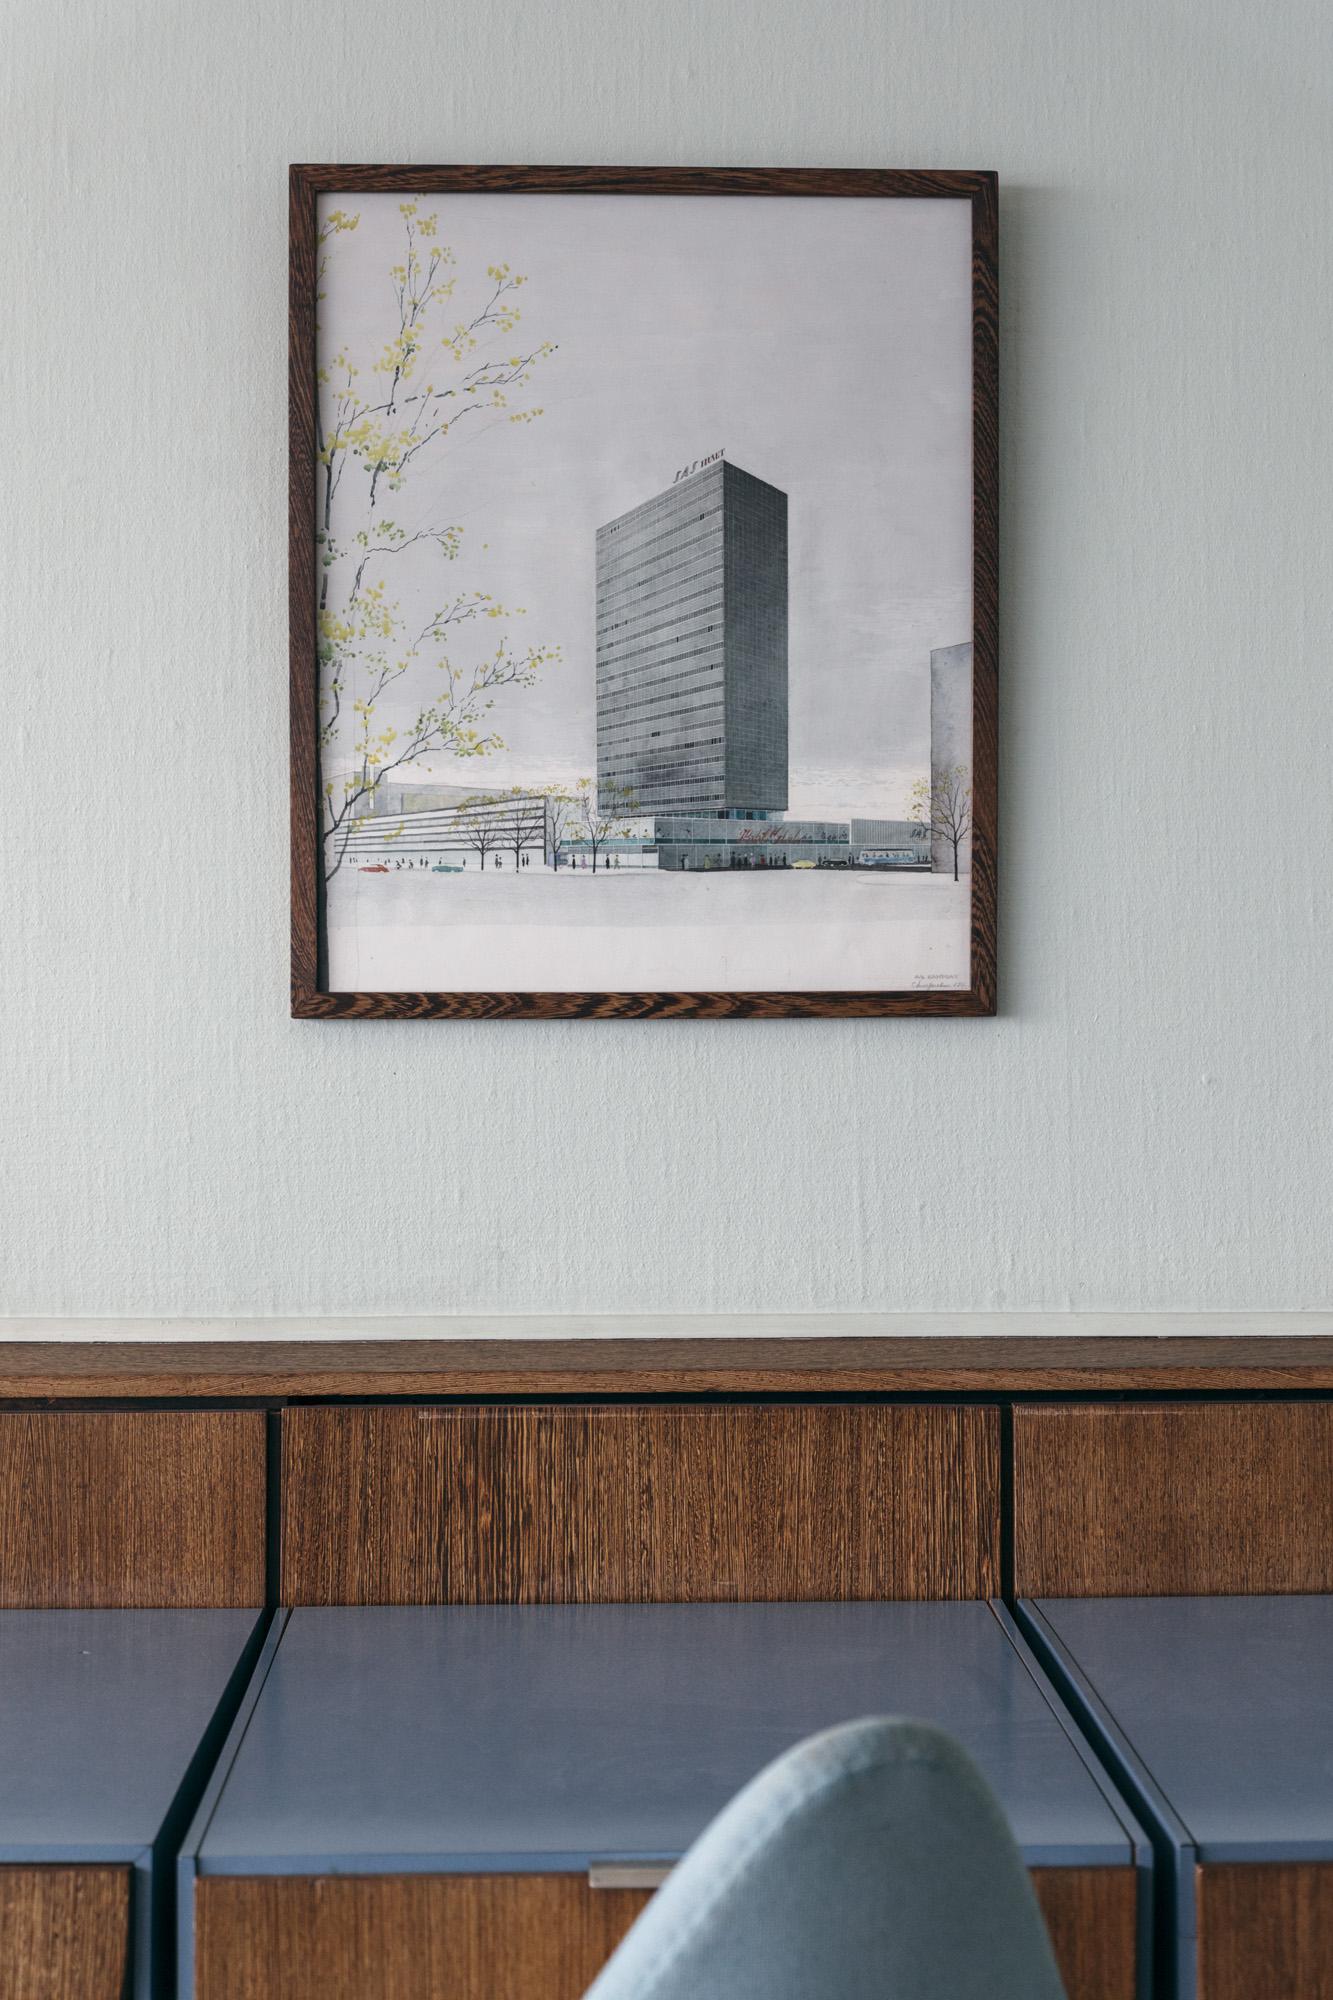 Andreas_Raun_Photographer_Radisson_Collection_Hotel_QuartzARA_8467.jpg